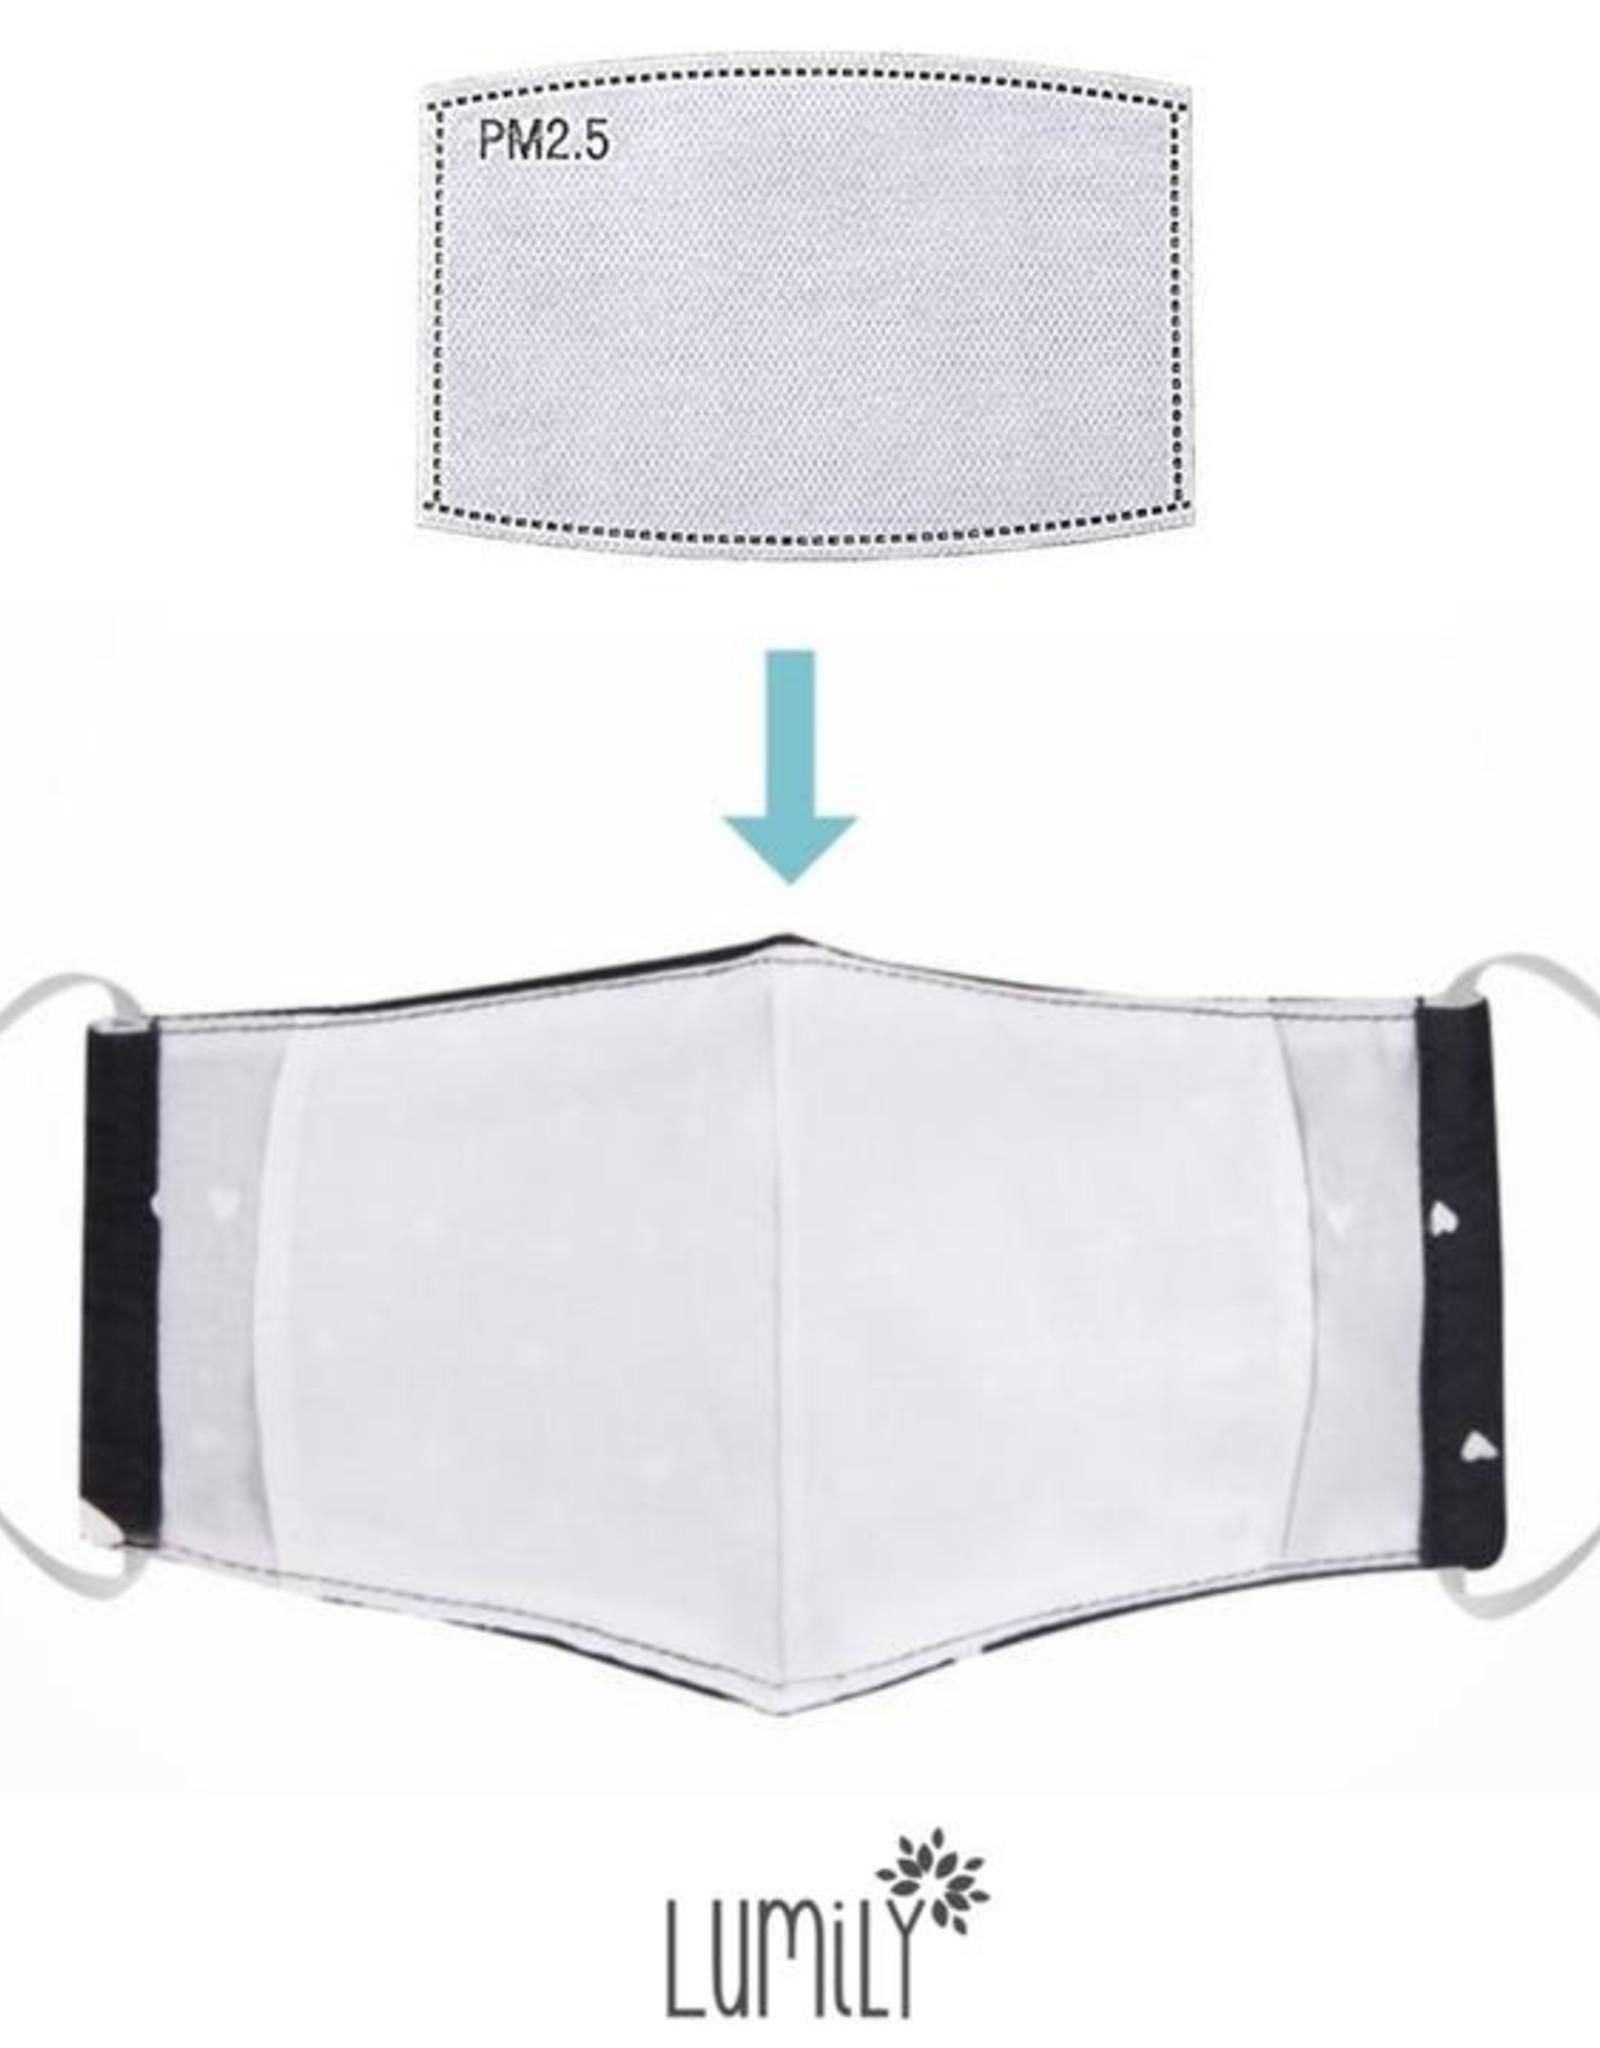 Black Elephant w/ Filter Pocket, 9-12